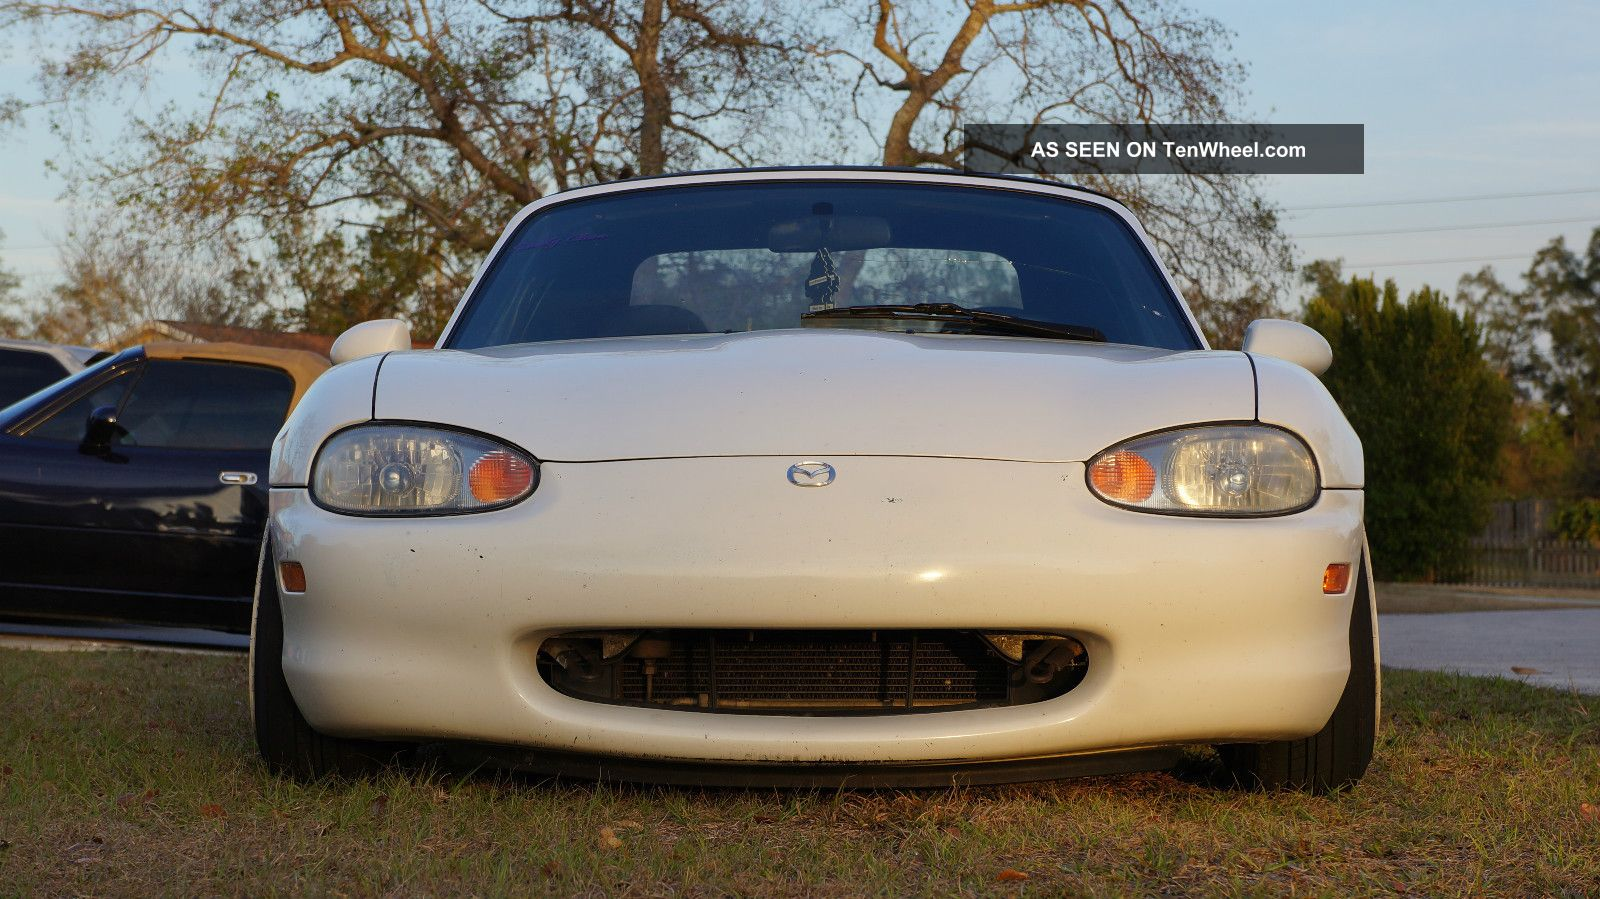 2000 Mazda Miata Ls Convertible 2 Door 1 8l Lowered